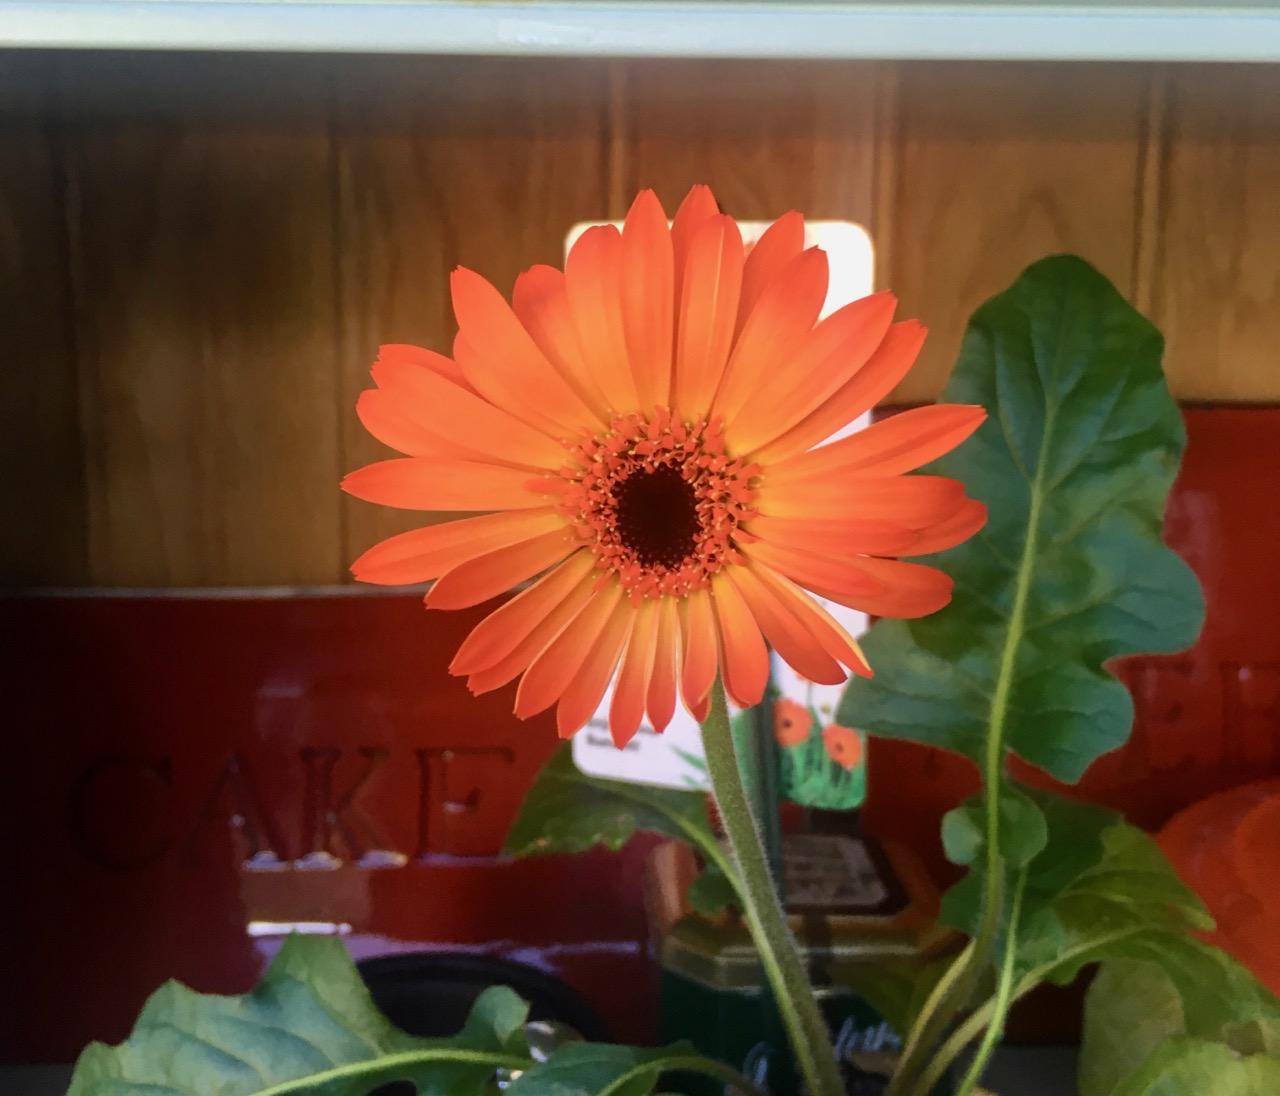 the sweet sunset gerbera in flower